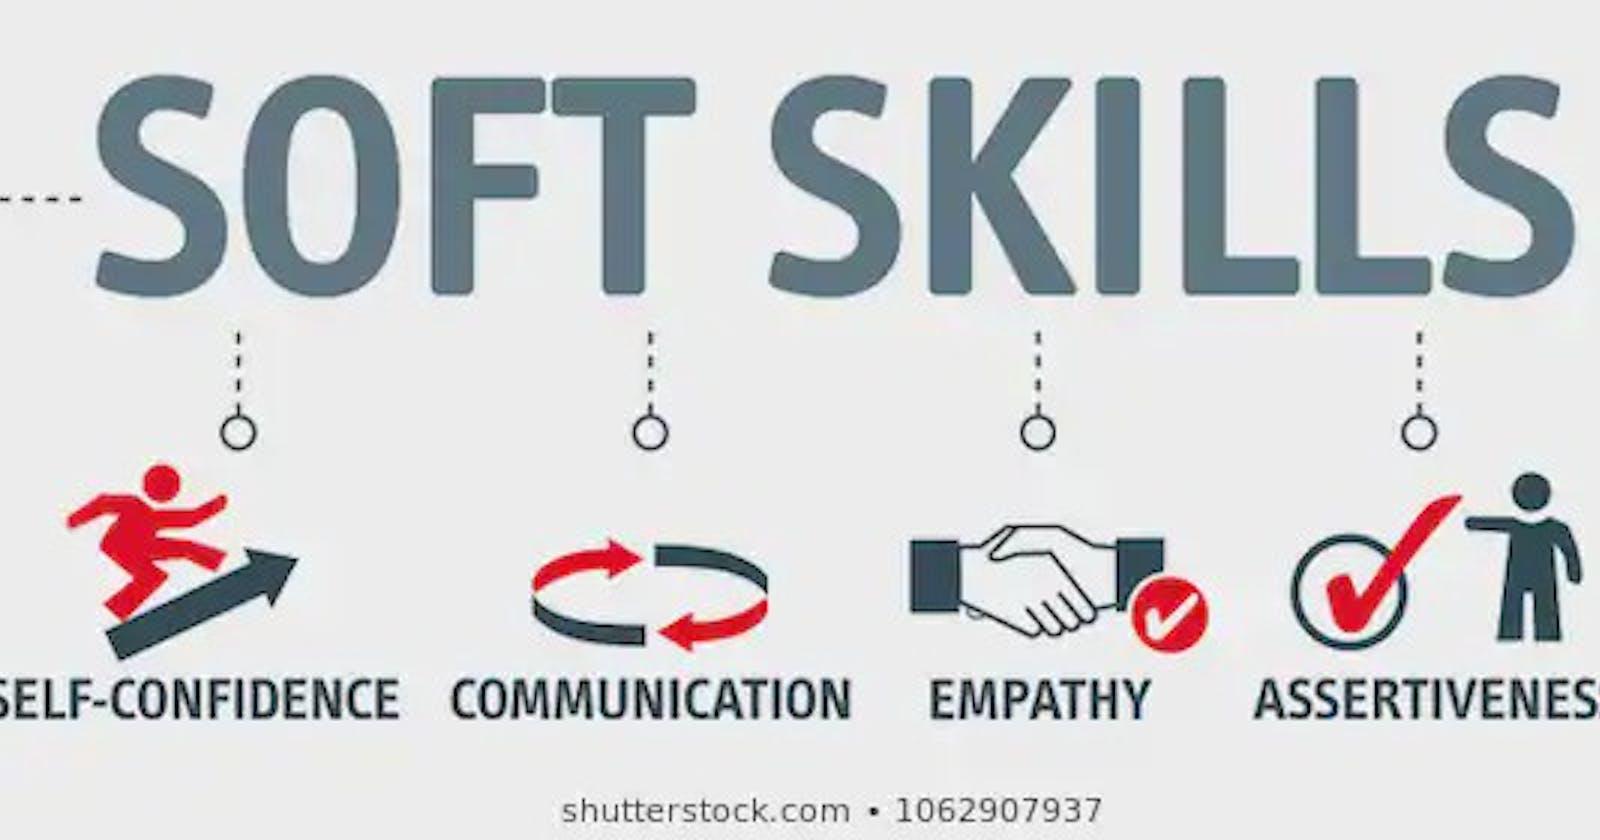 Why soft skills matter for a developer?